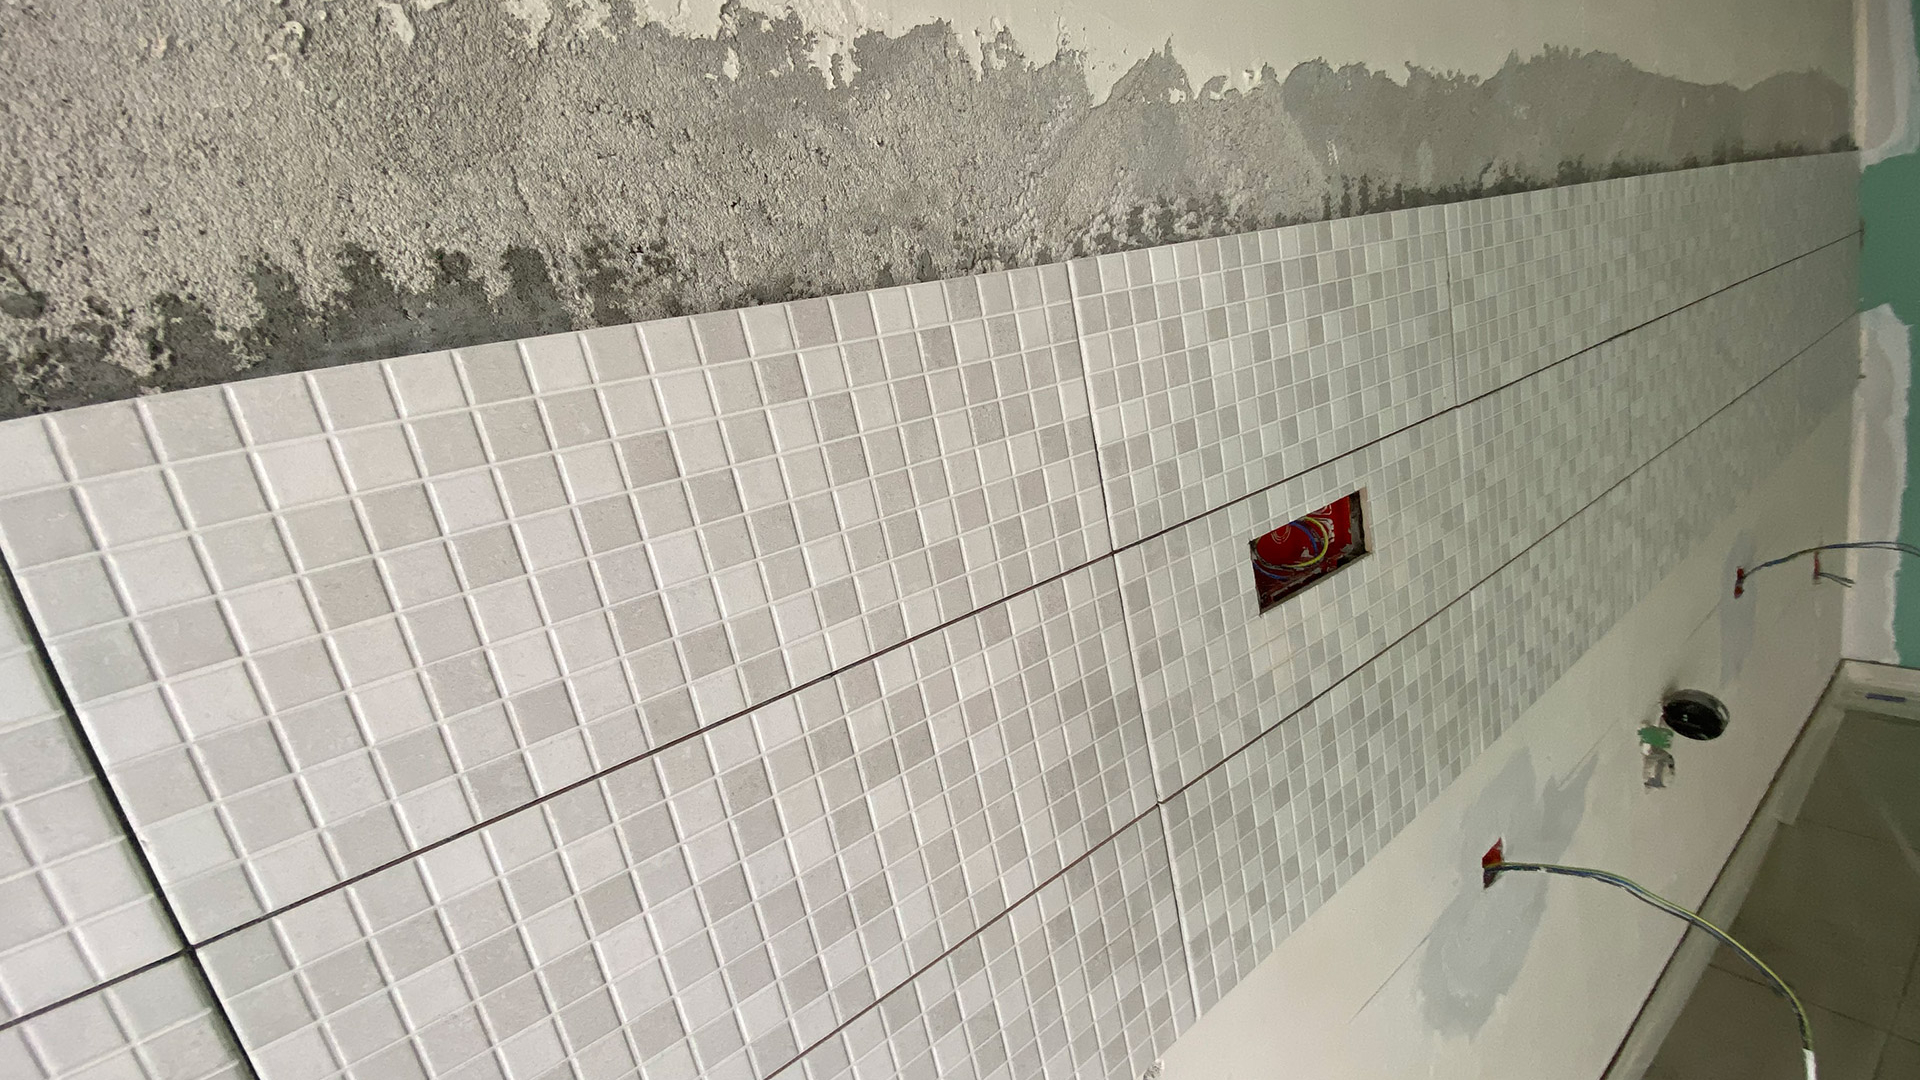 Stadiu executie Uverturii Residence 8 Mai 2020 - Apartamente si garsoniere de vanzare Militari, Gorjului - 4